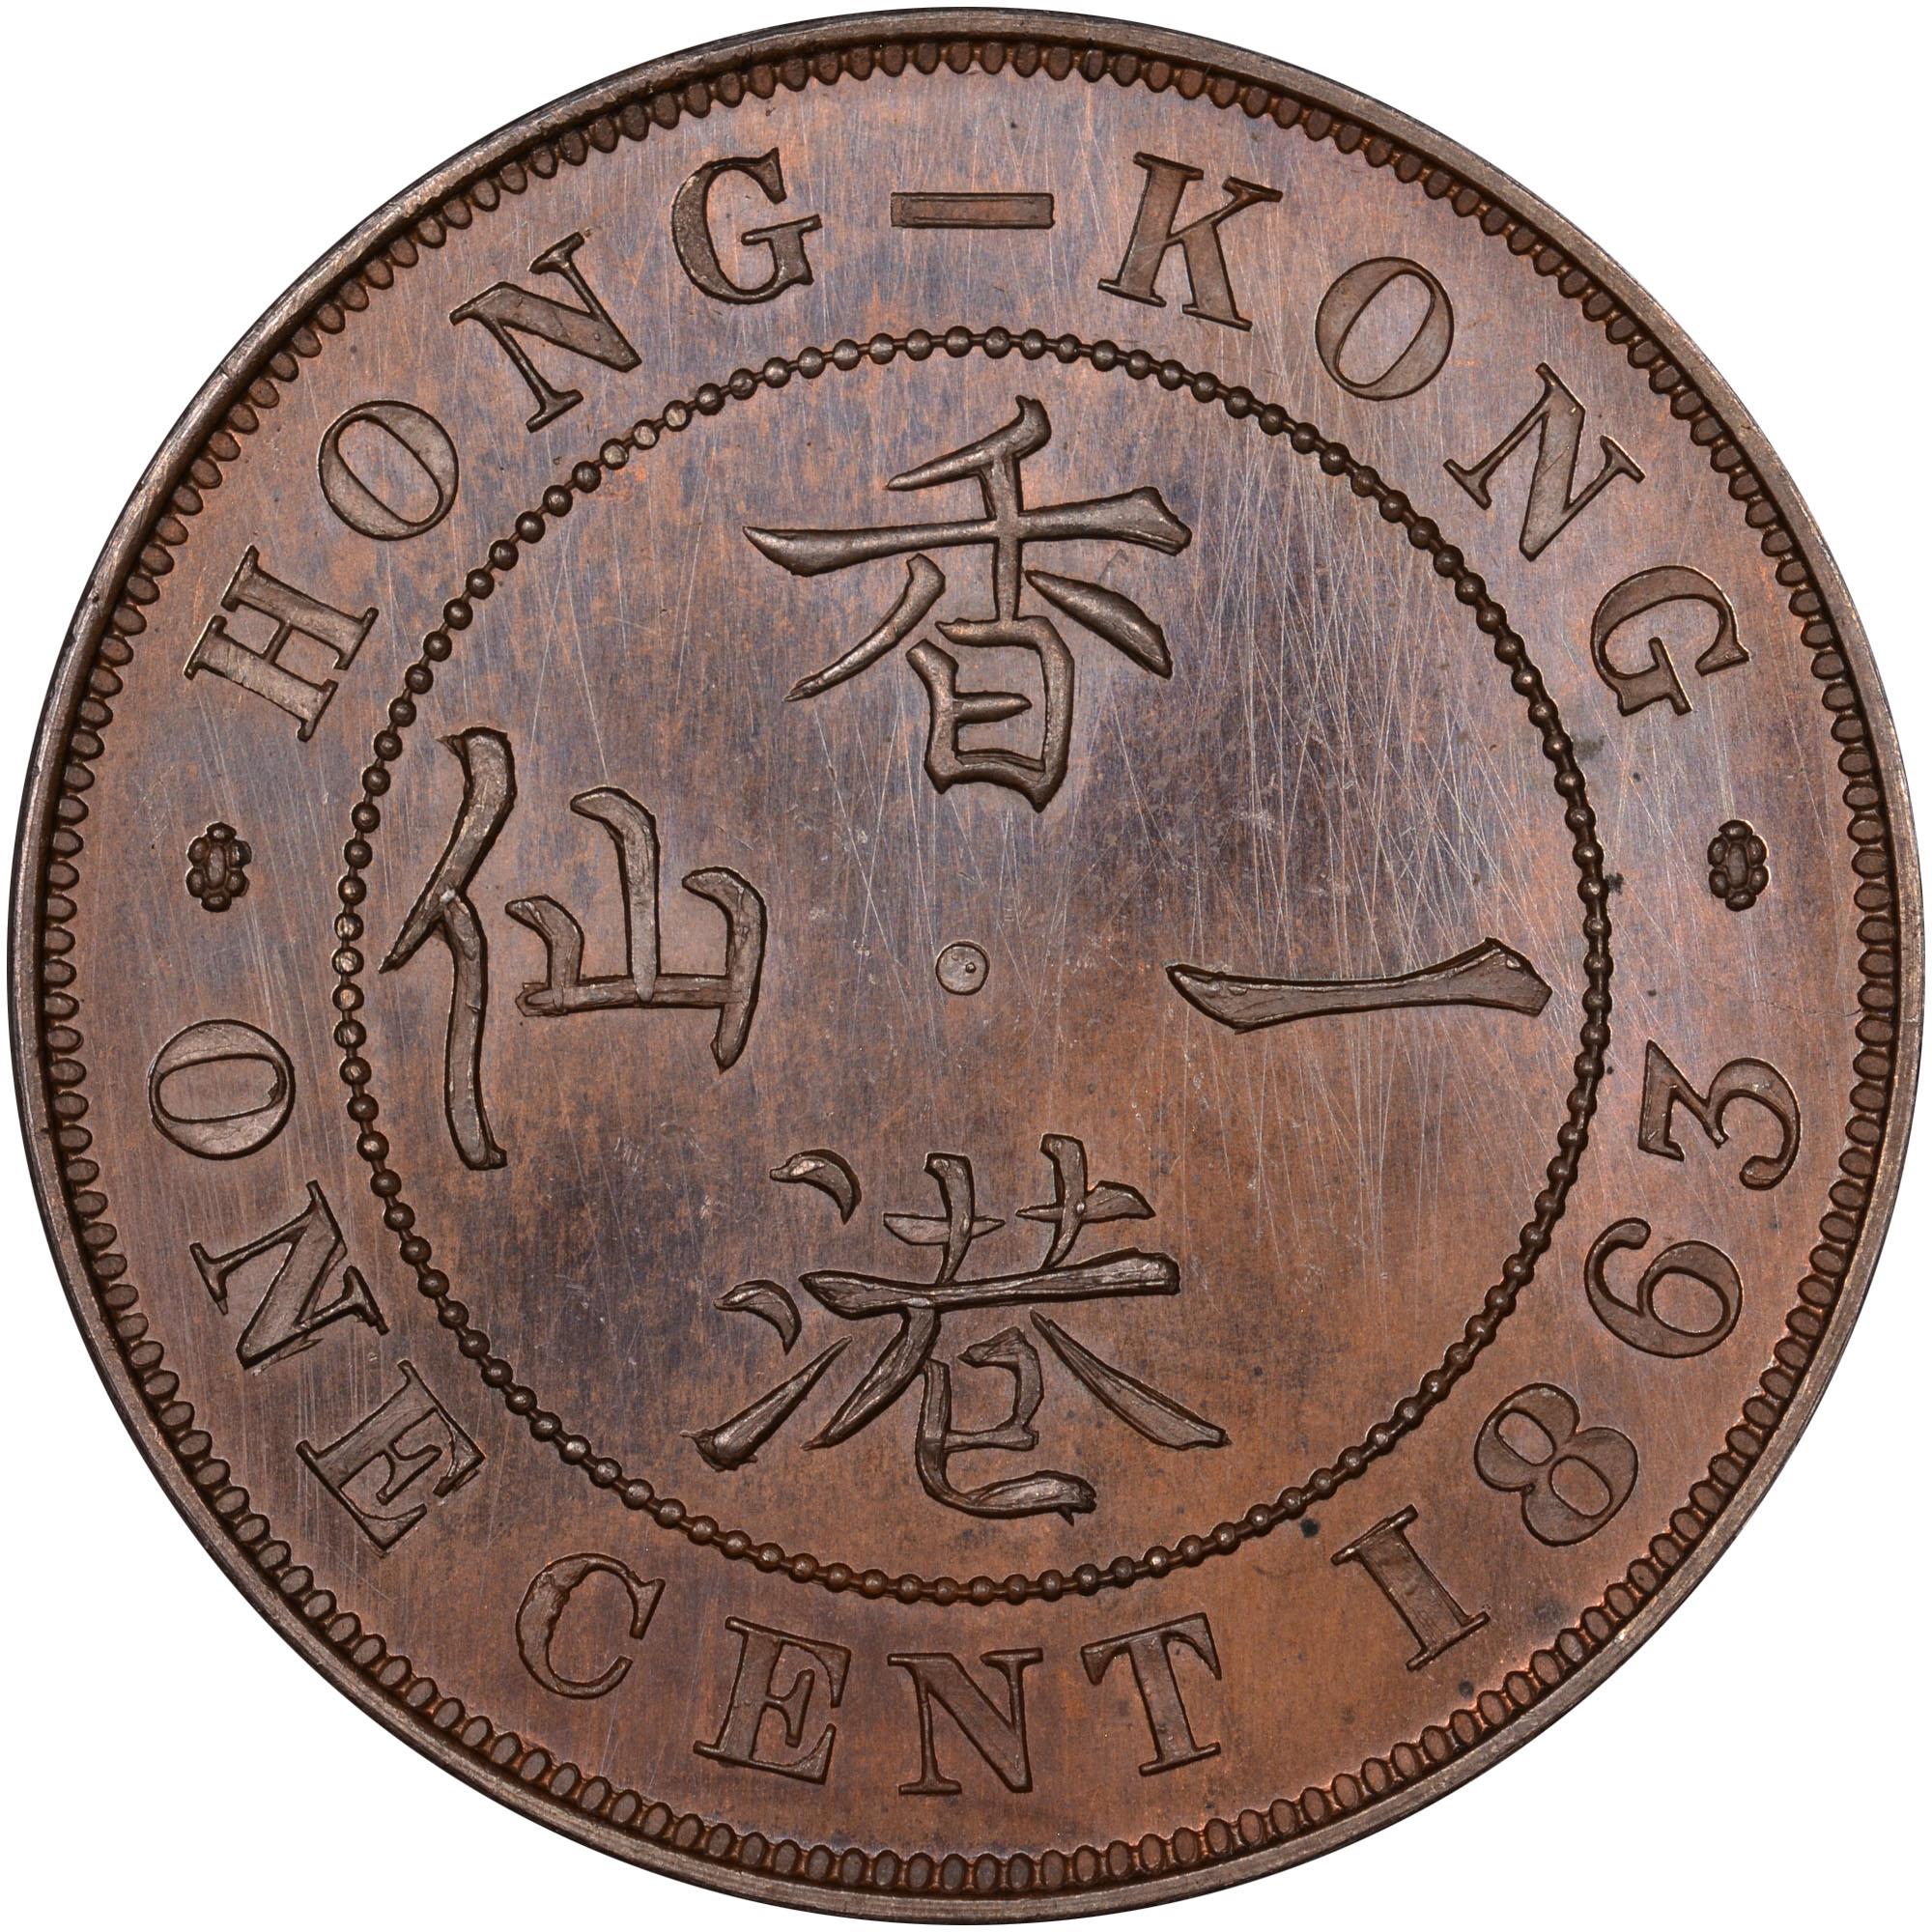 Price Hong Kong Manufacturer: Hong Kong Cent KM 4.1 Prices & Values